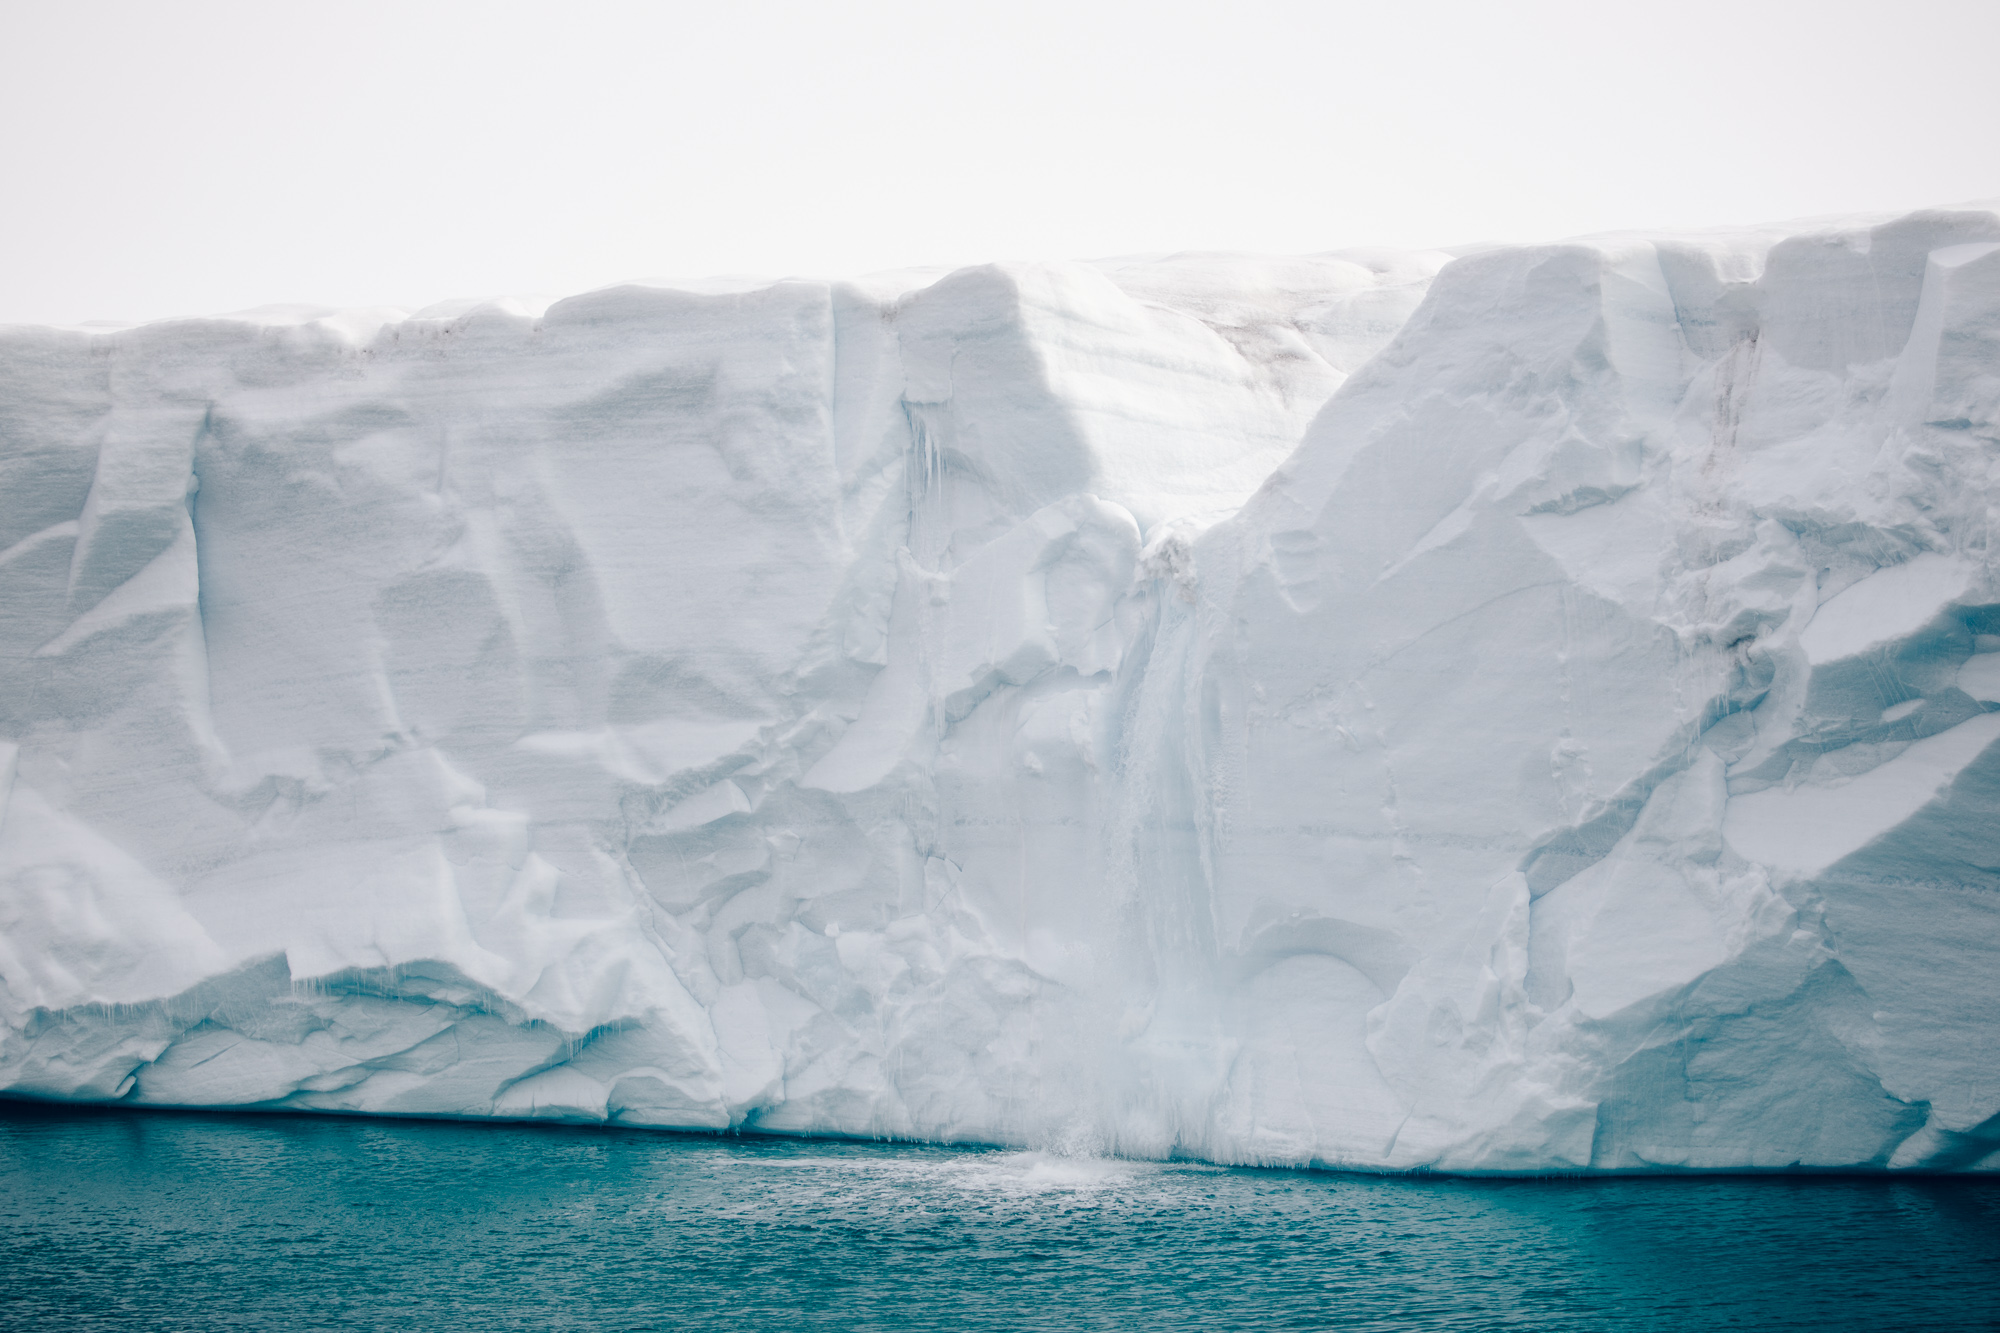 Glacier front Bråsvellbreen in Svalbard and Jan Mayen, Norway